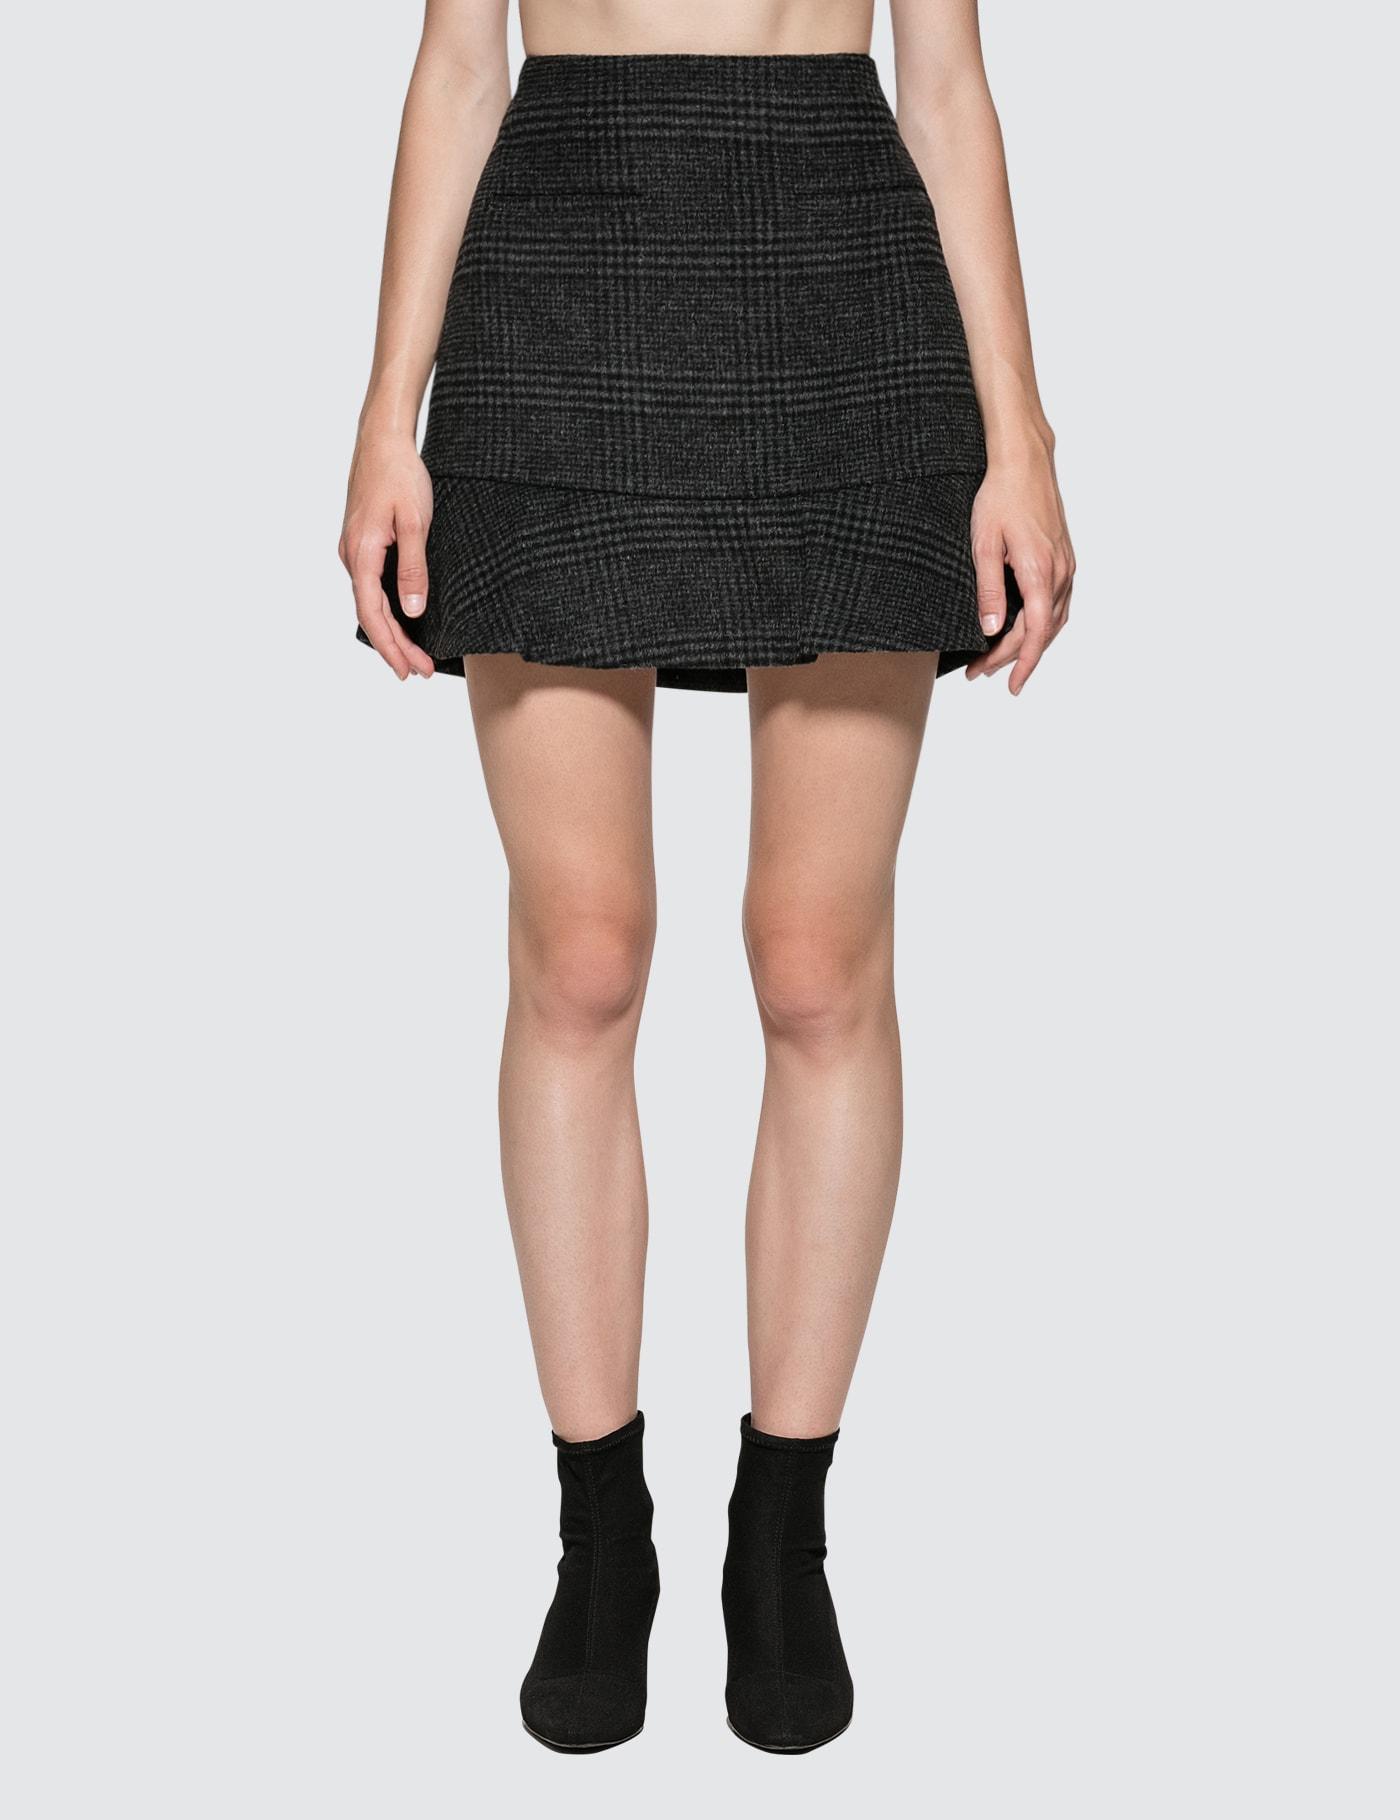 Woodside Plaid Skirt